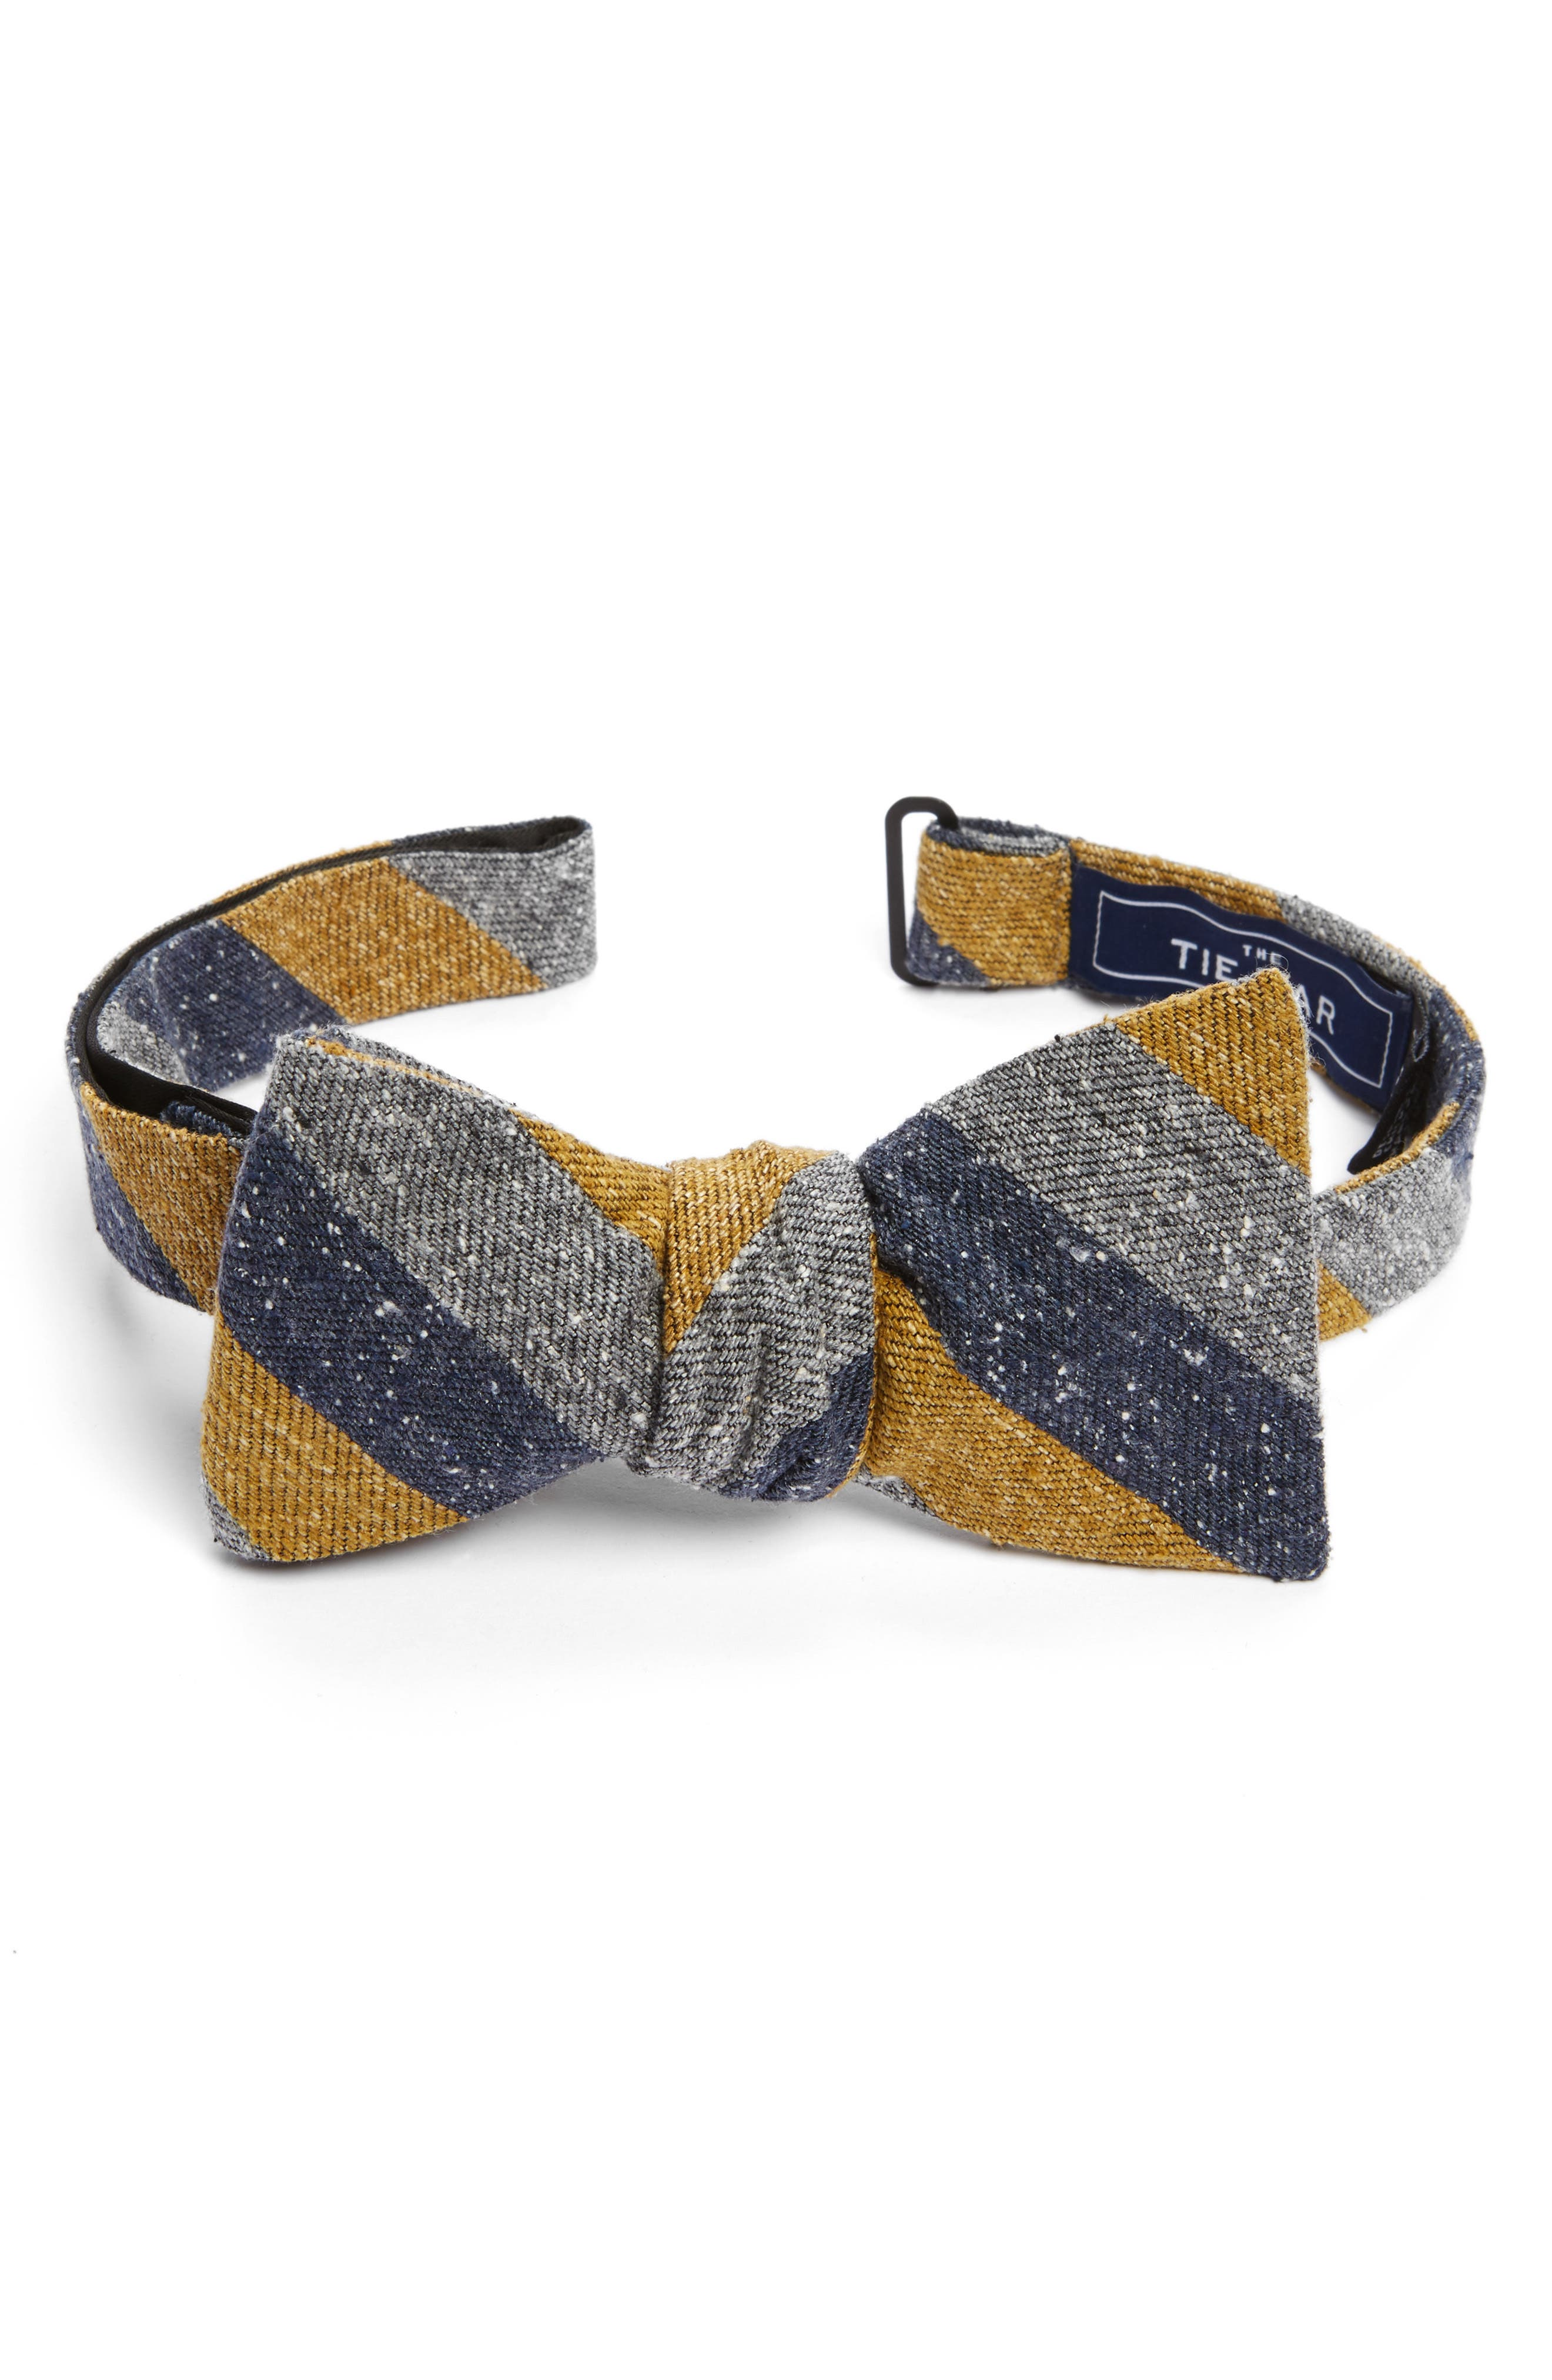 Alternate Image 1 Selected - The Tie Bar Varios Stripe Silk Bow Tie